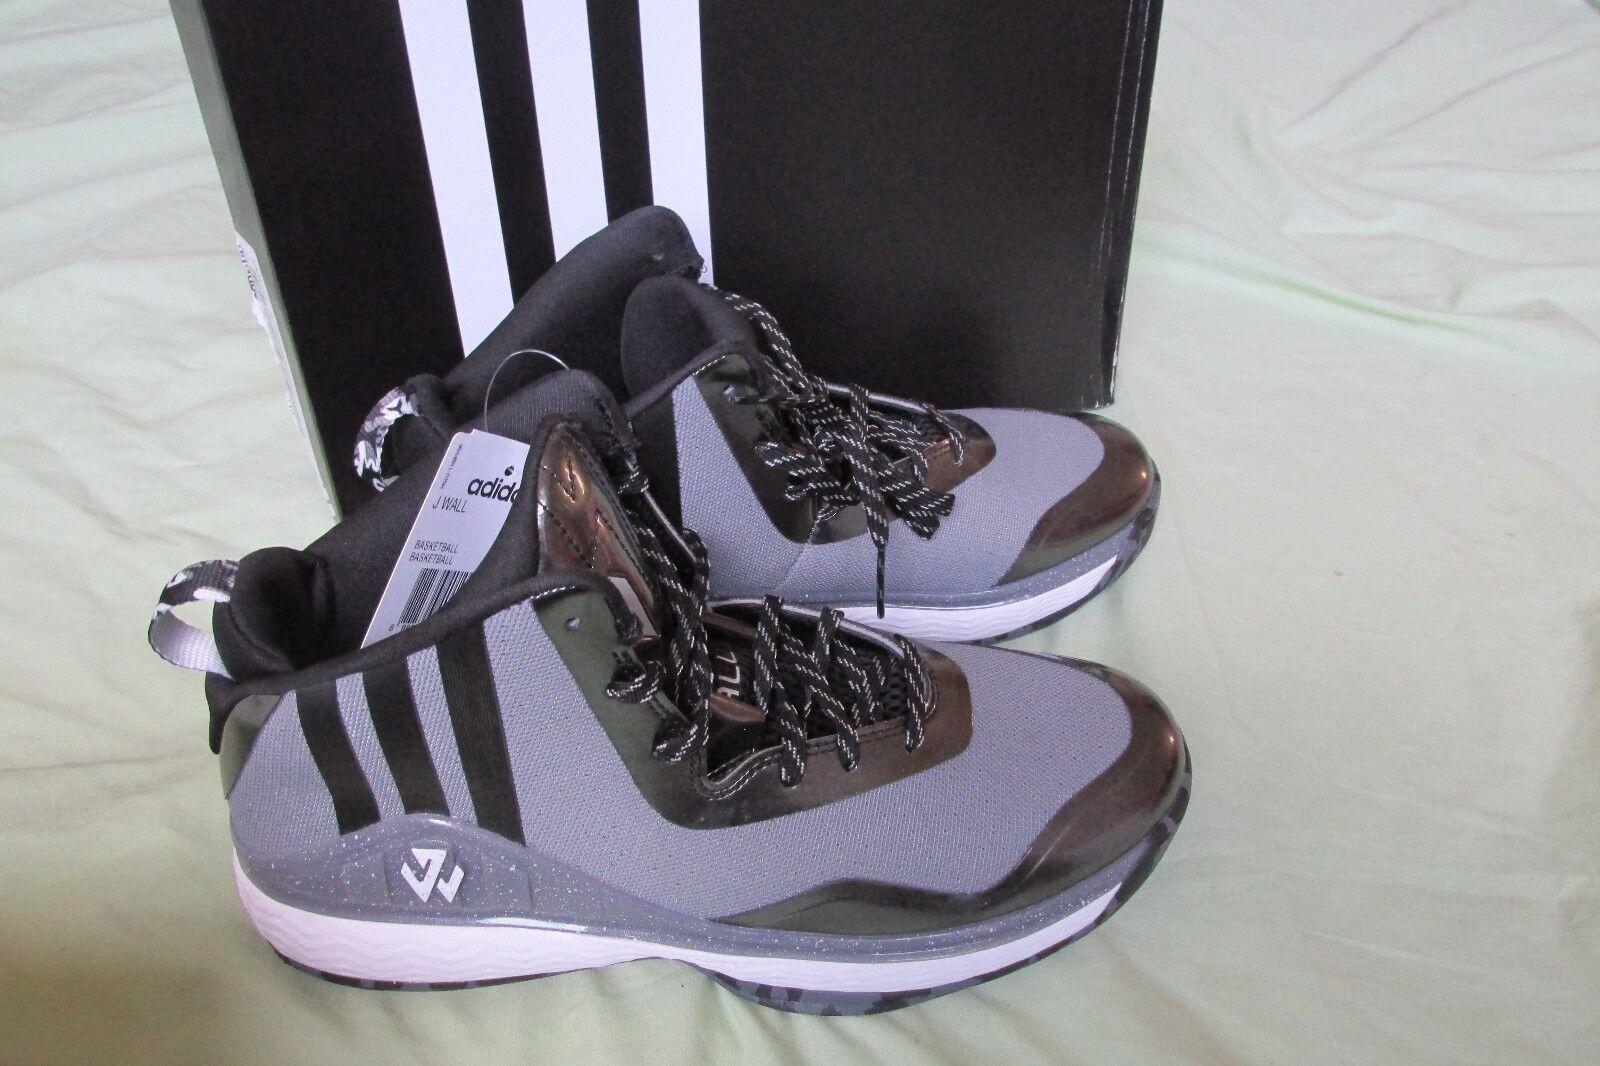 Nuovo Adidas J Wall Medio Uomo Scarpe da Basket Taglia 8 Grigio Onice ~ Nero ~